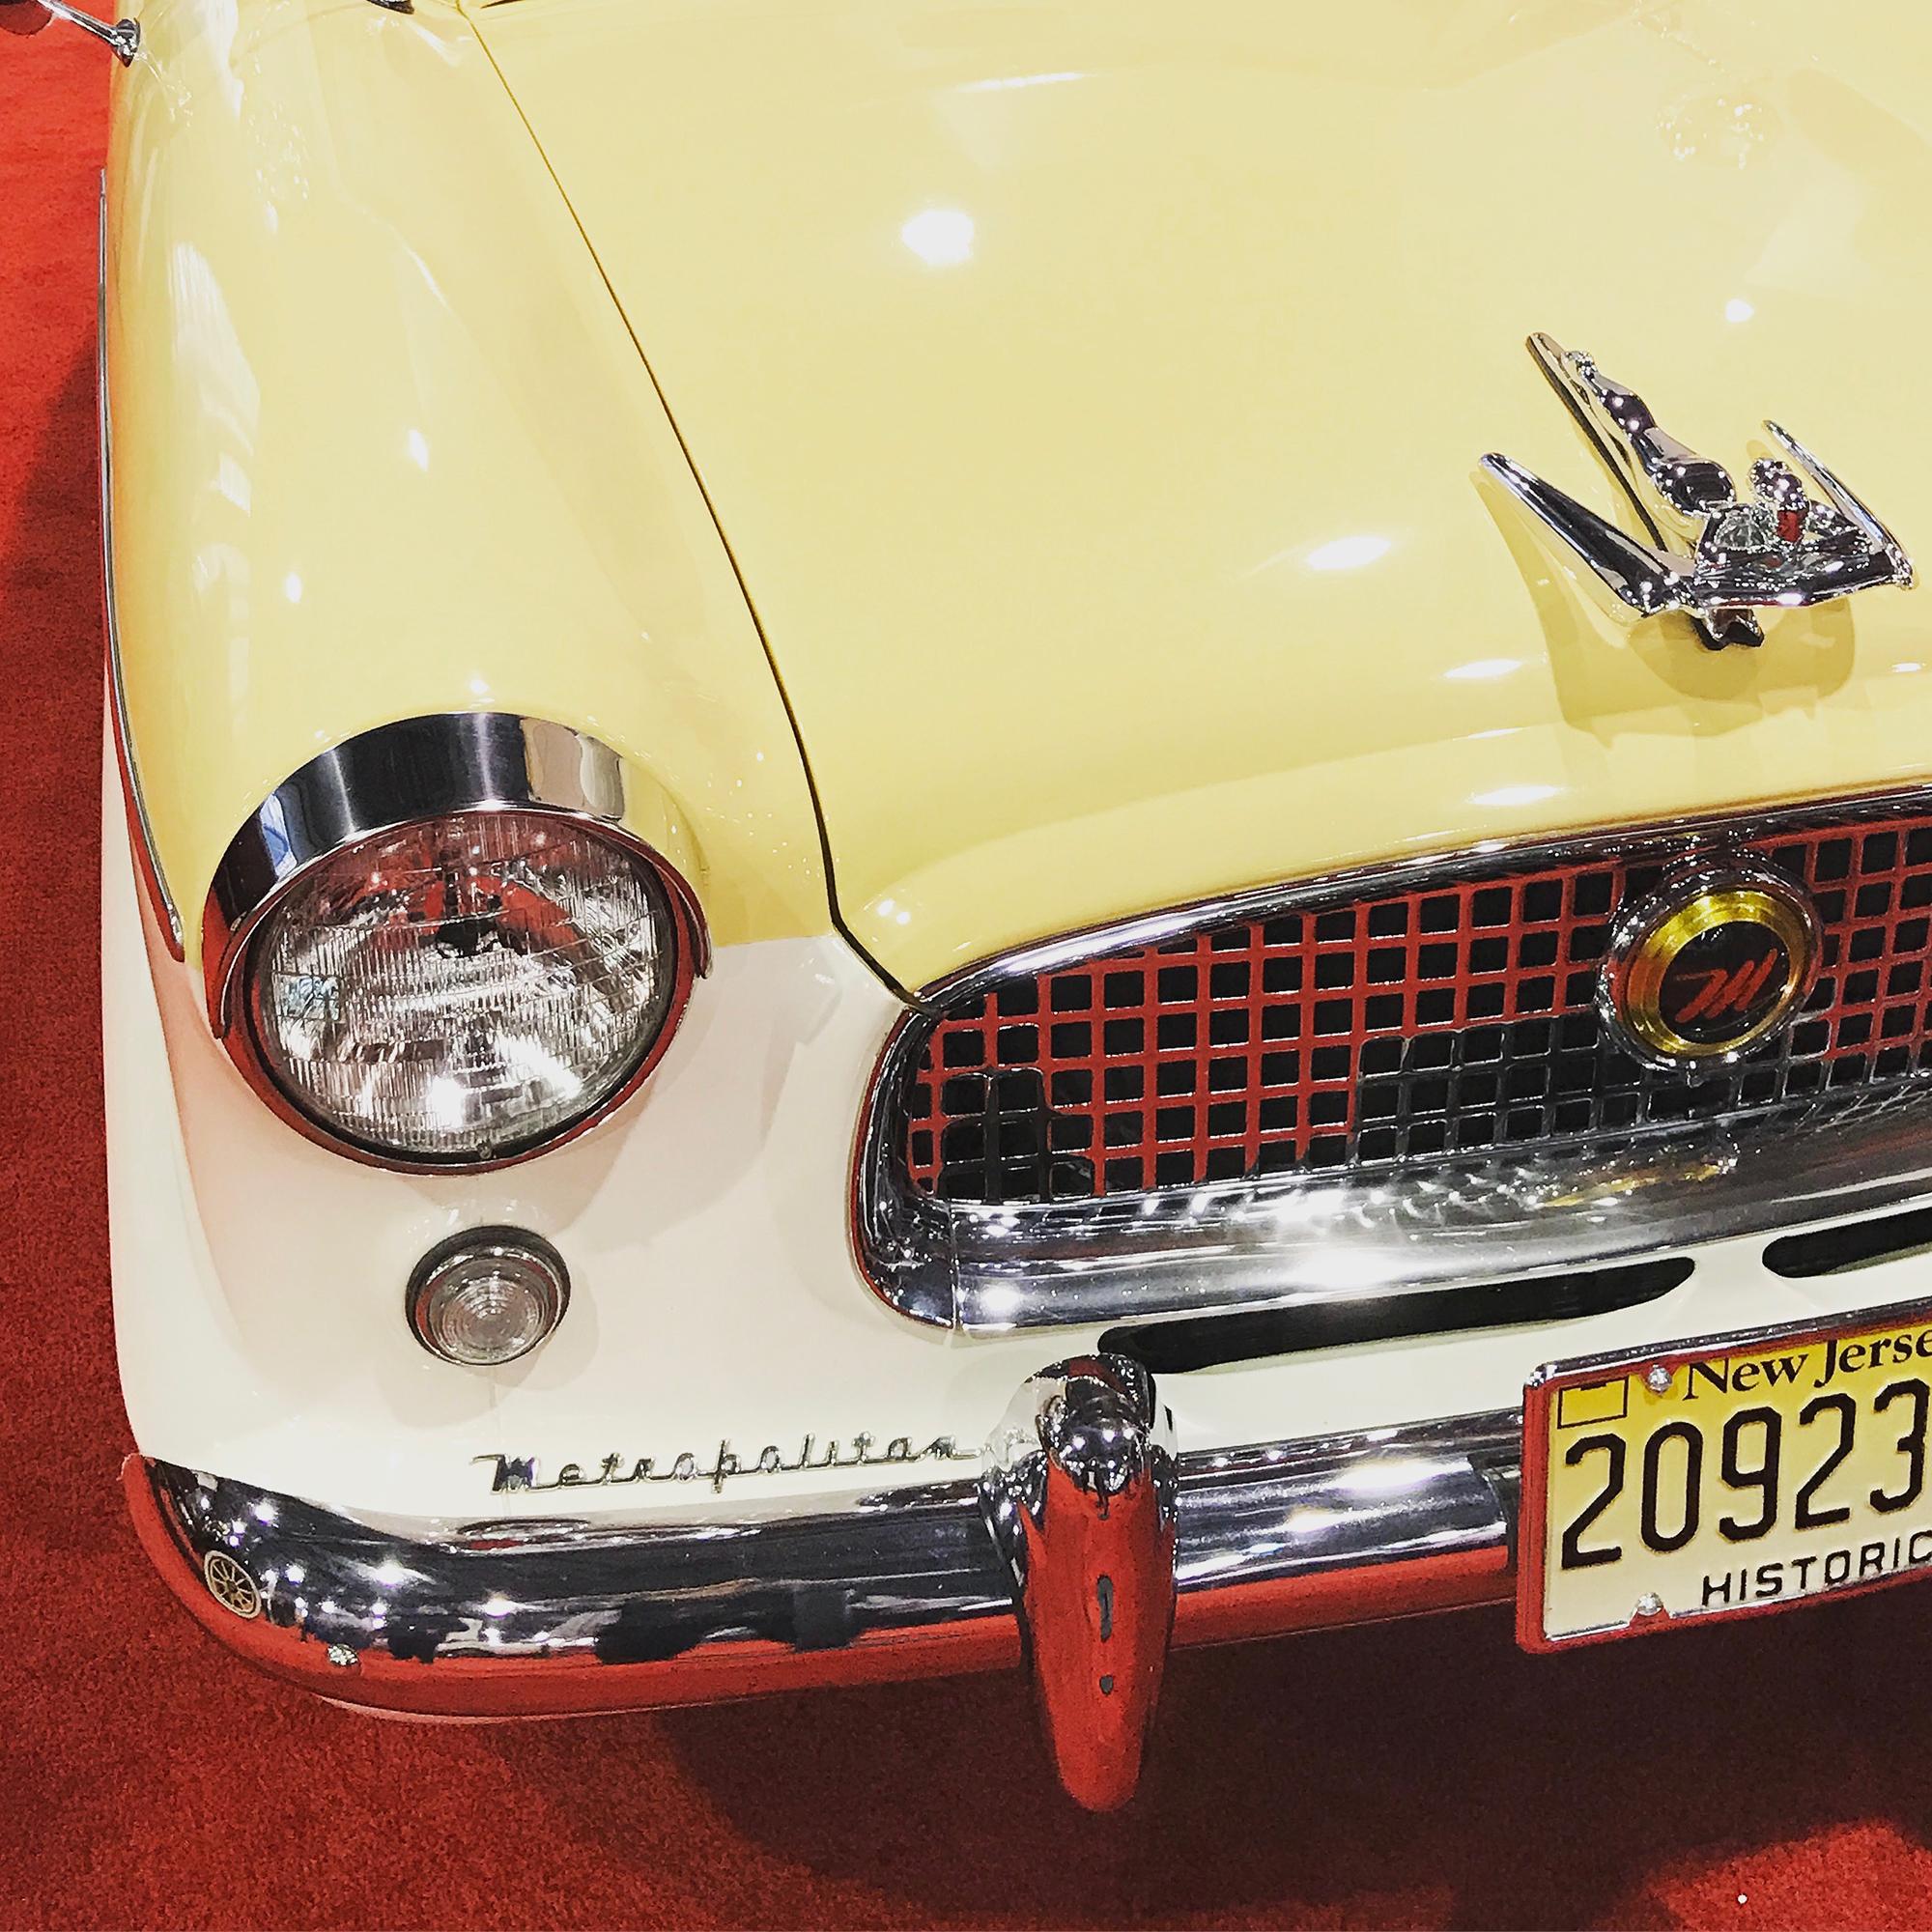 Auto Show, Philadelphia, PA